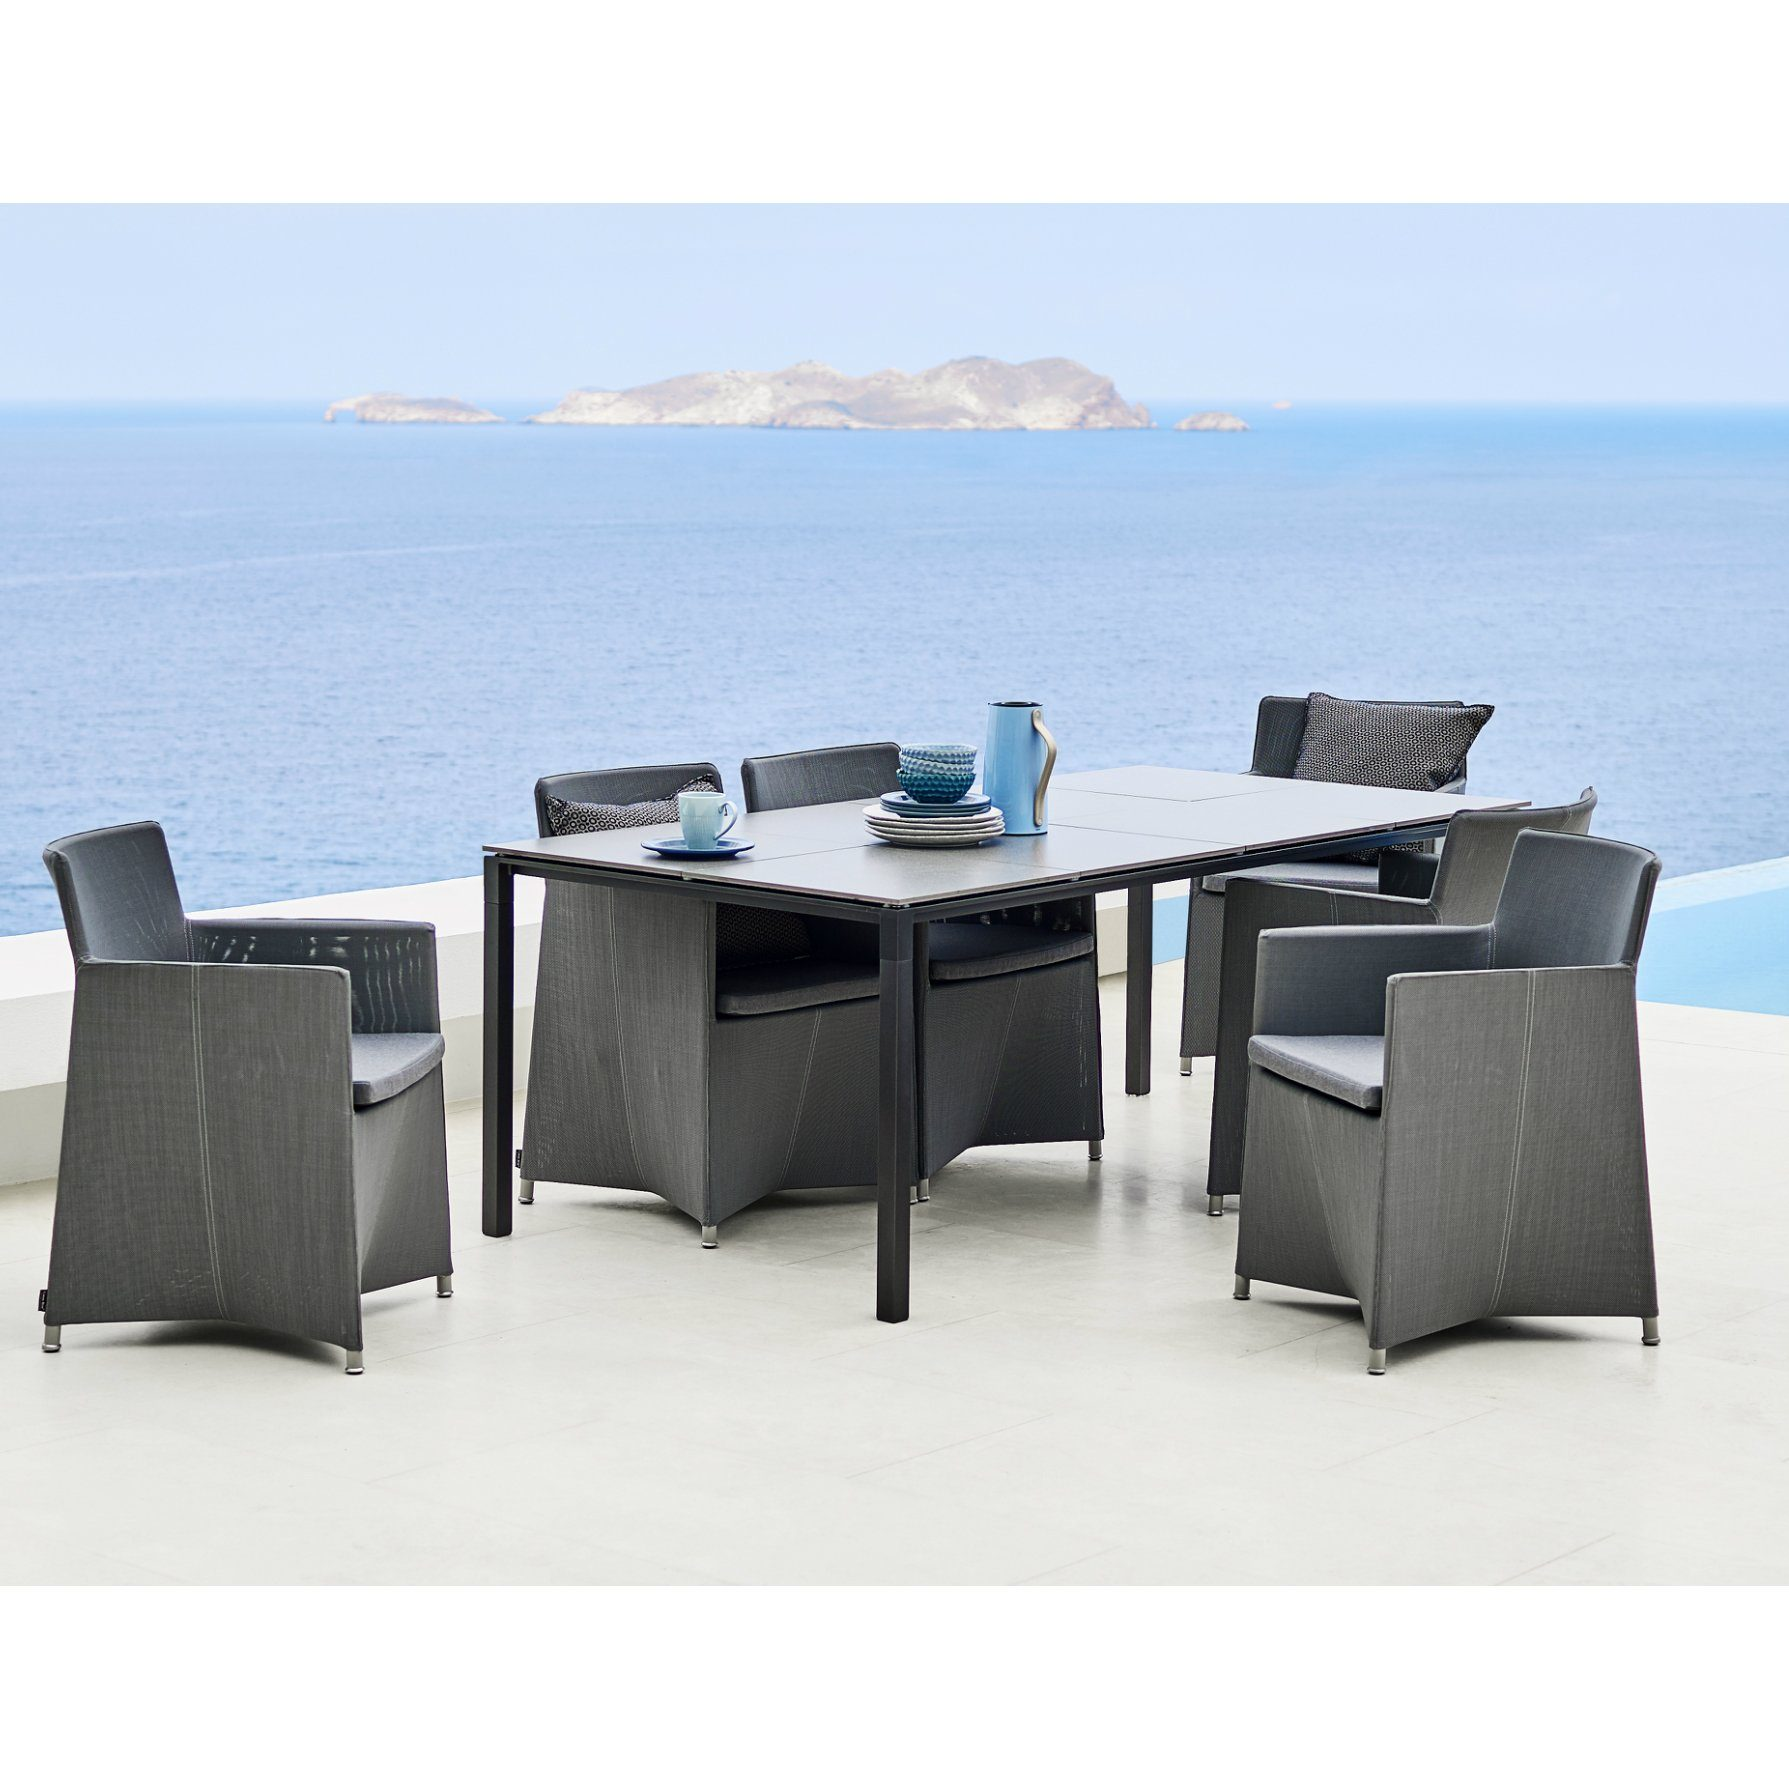 cane line gartentisch pure aluminium. Black Bedroom Furniture Sets. Home Design Ideas